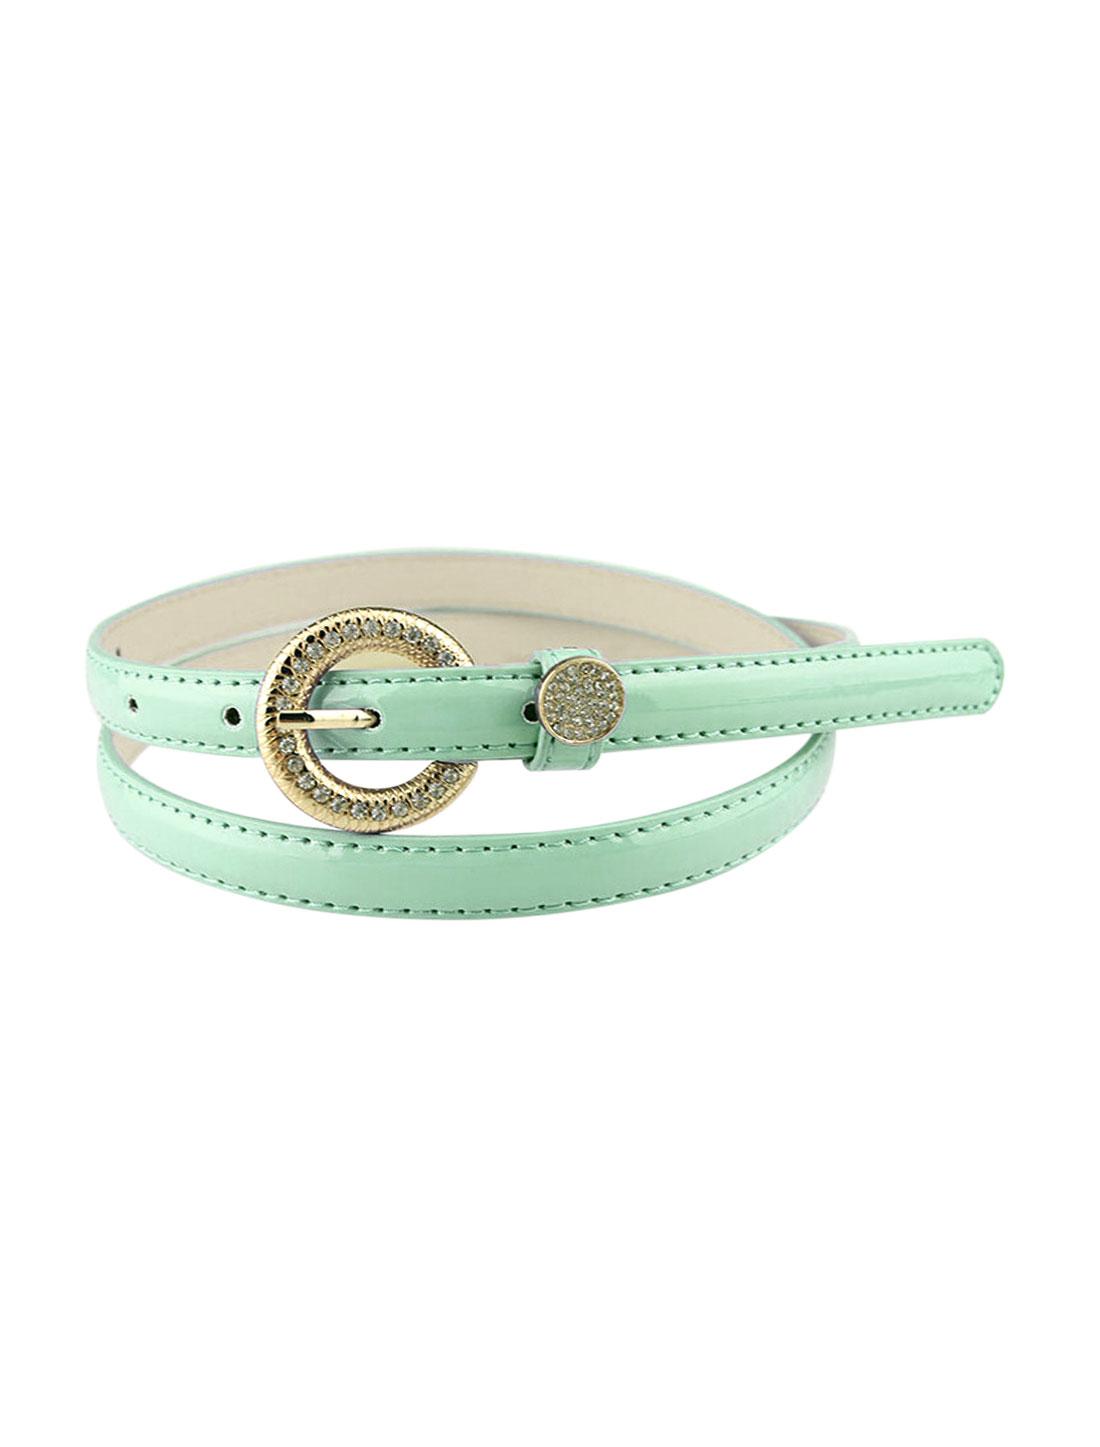 Women Rhinestone Decor Single Pin Buckle Waist Belt Green